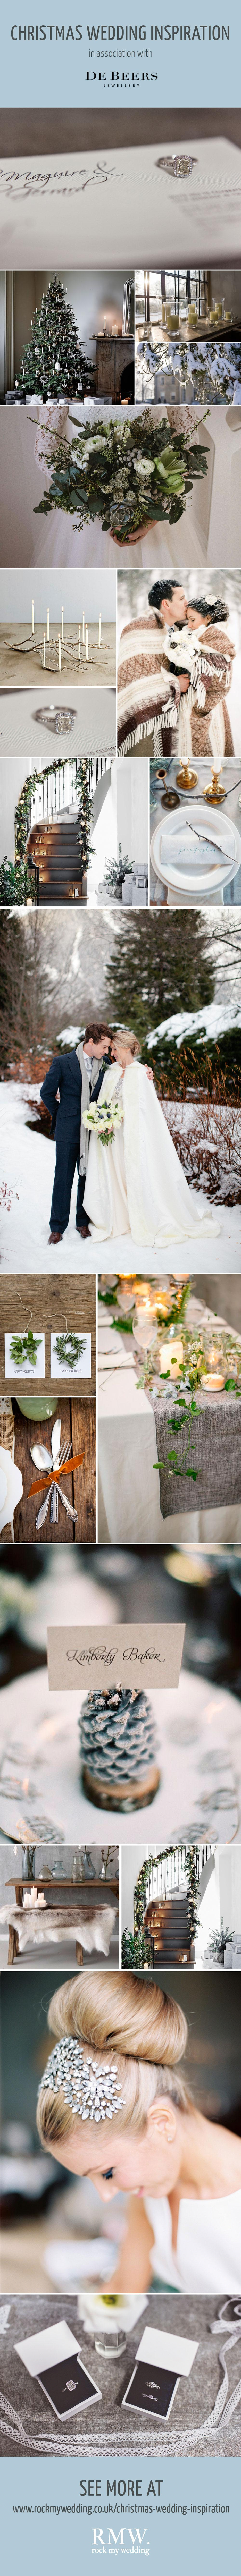 Christmas Wedding Styling Ideas